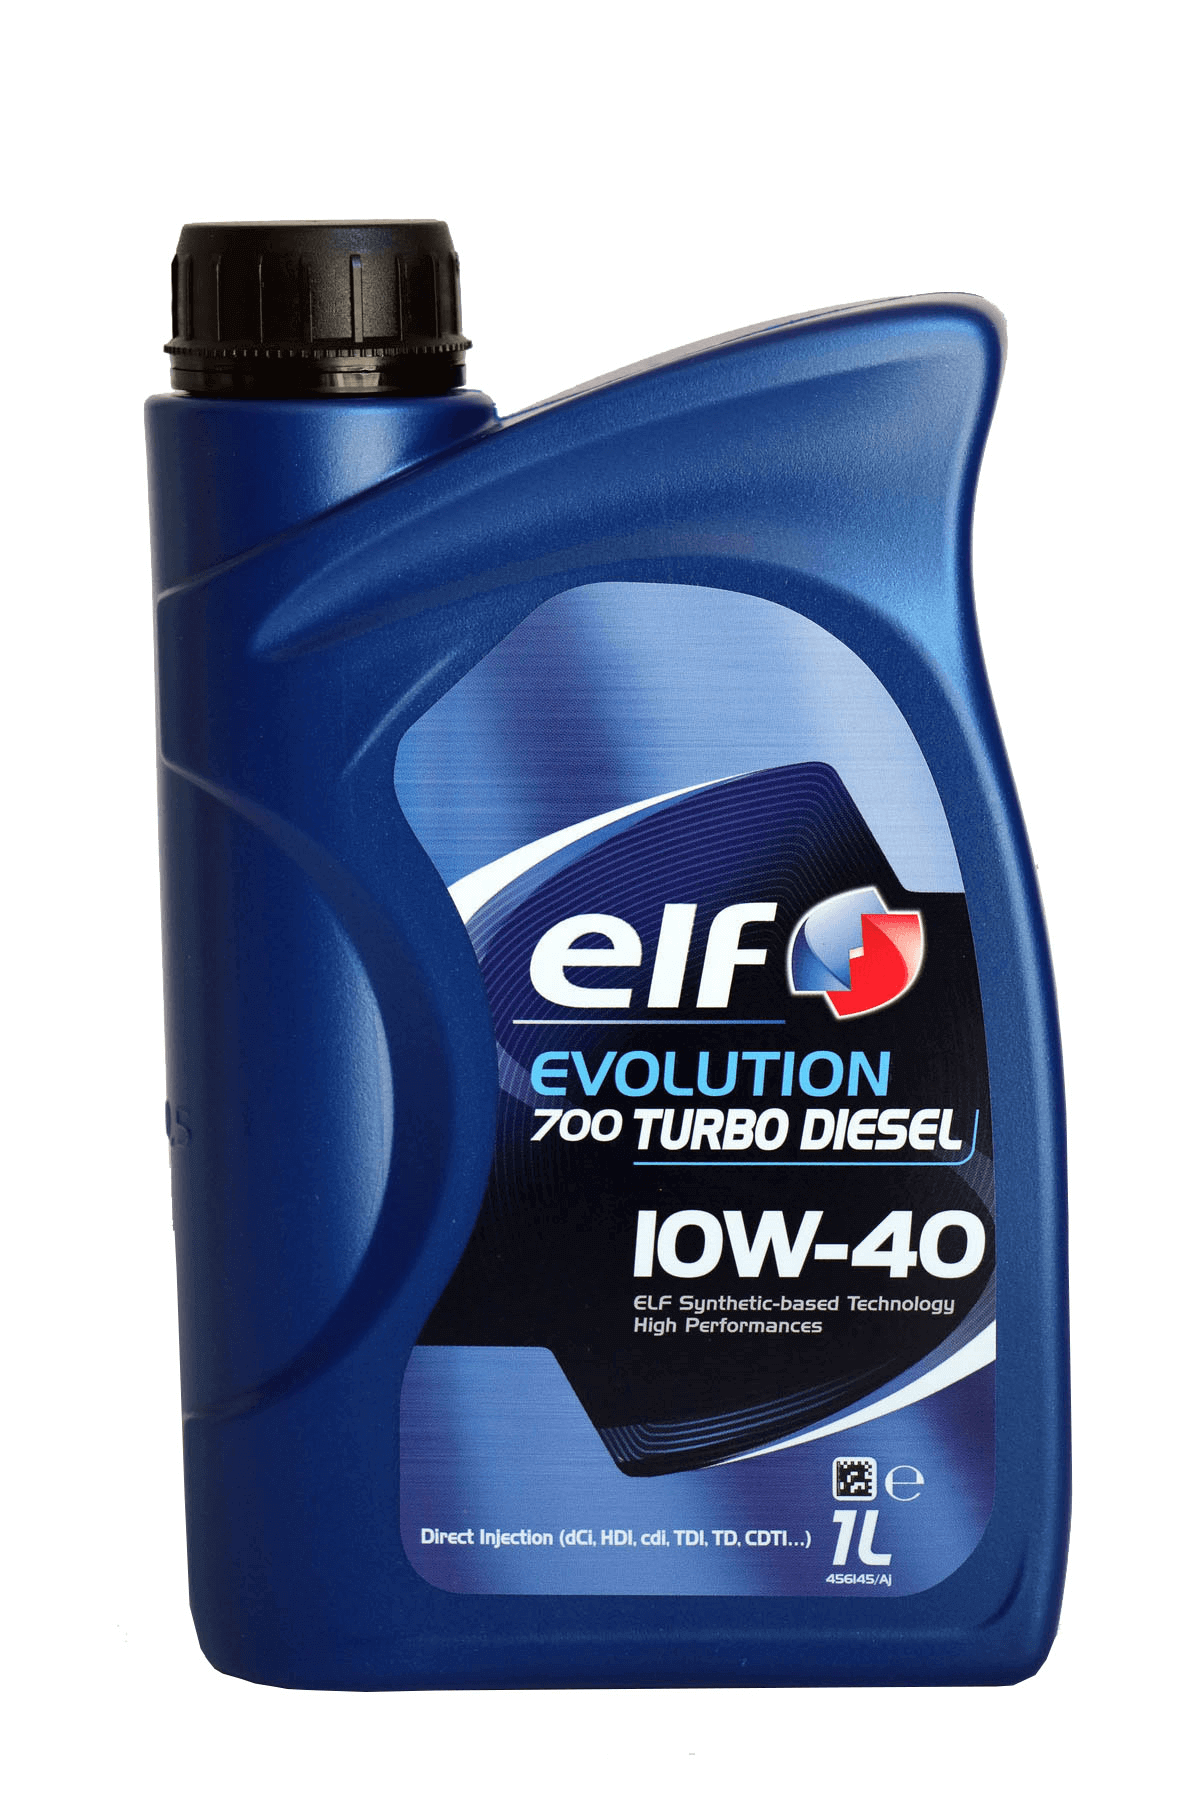 ELF Evolution 700 Turbo Diesel 10W-40 Motoröl, 1l